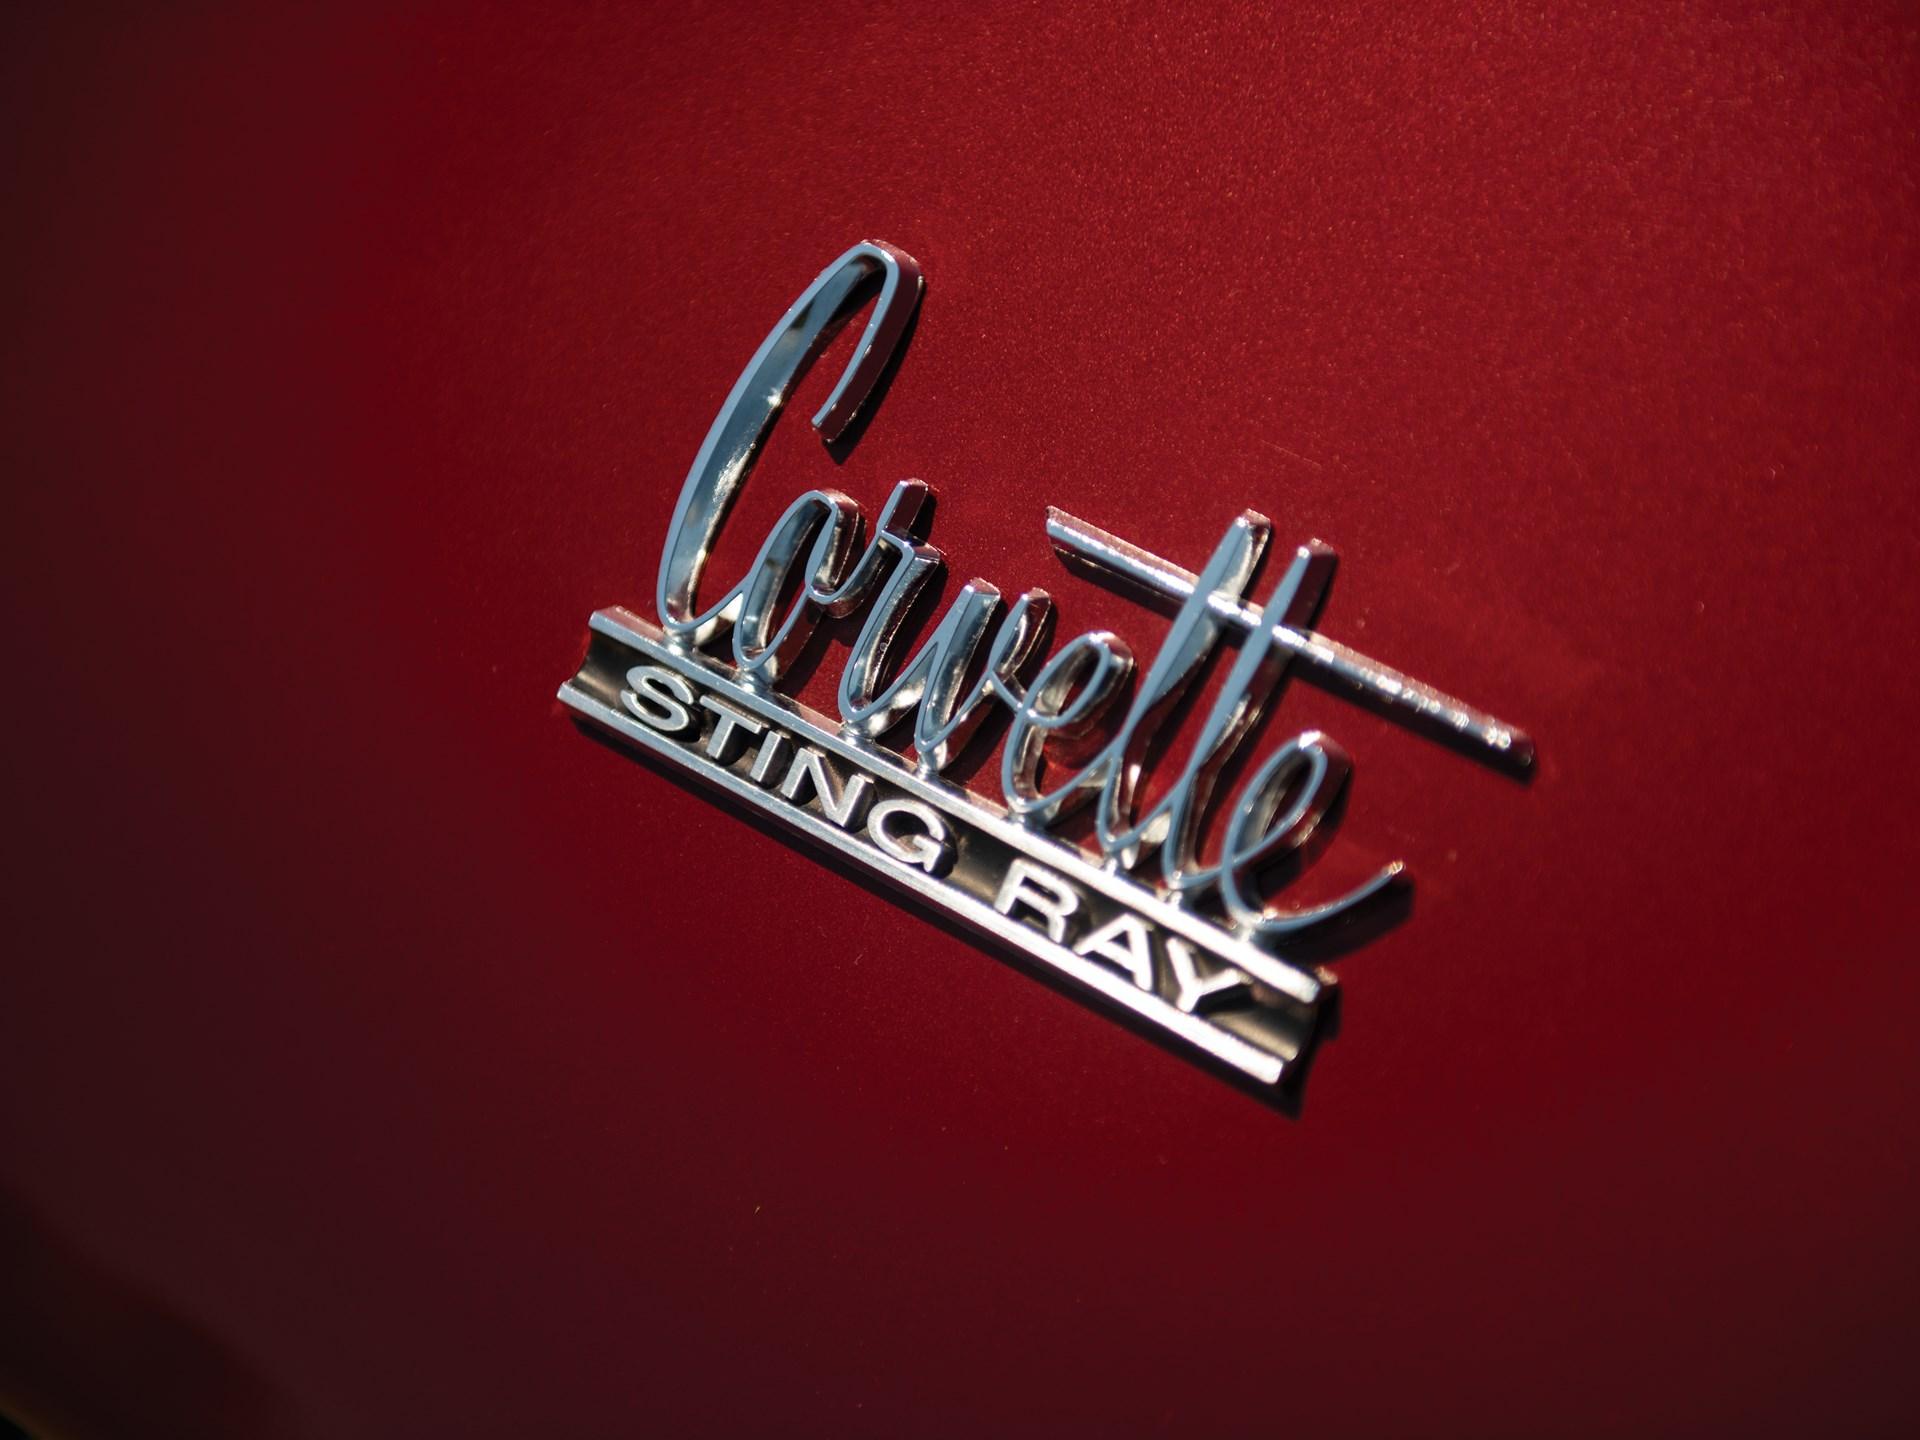 1966 Chevrolet Corvette Sting Ray 427/425 Coupe